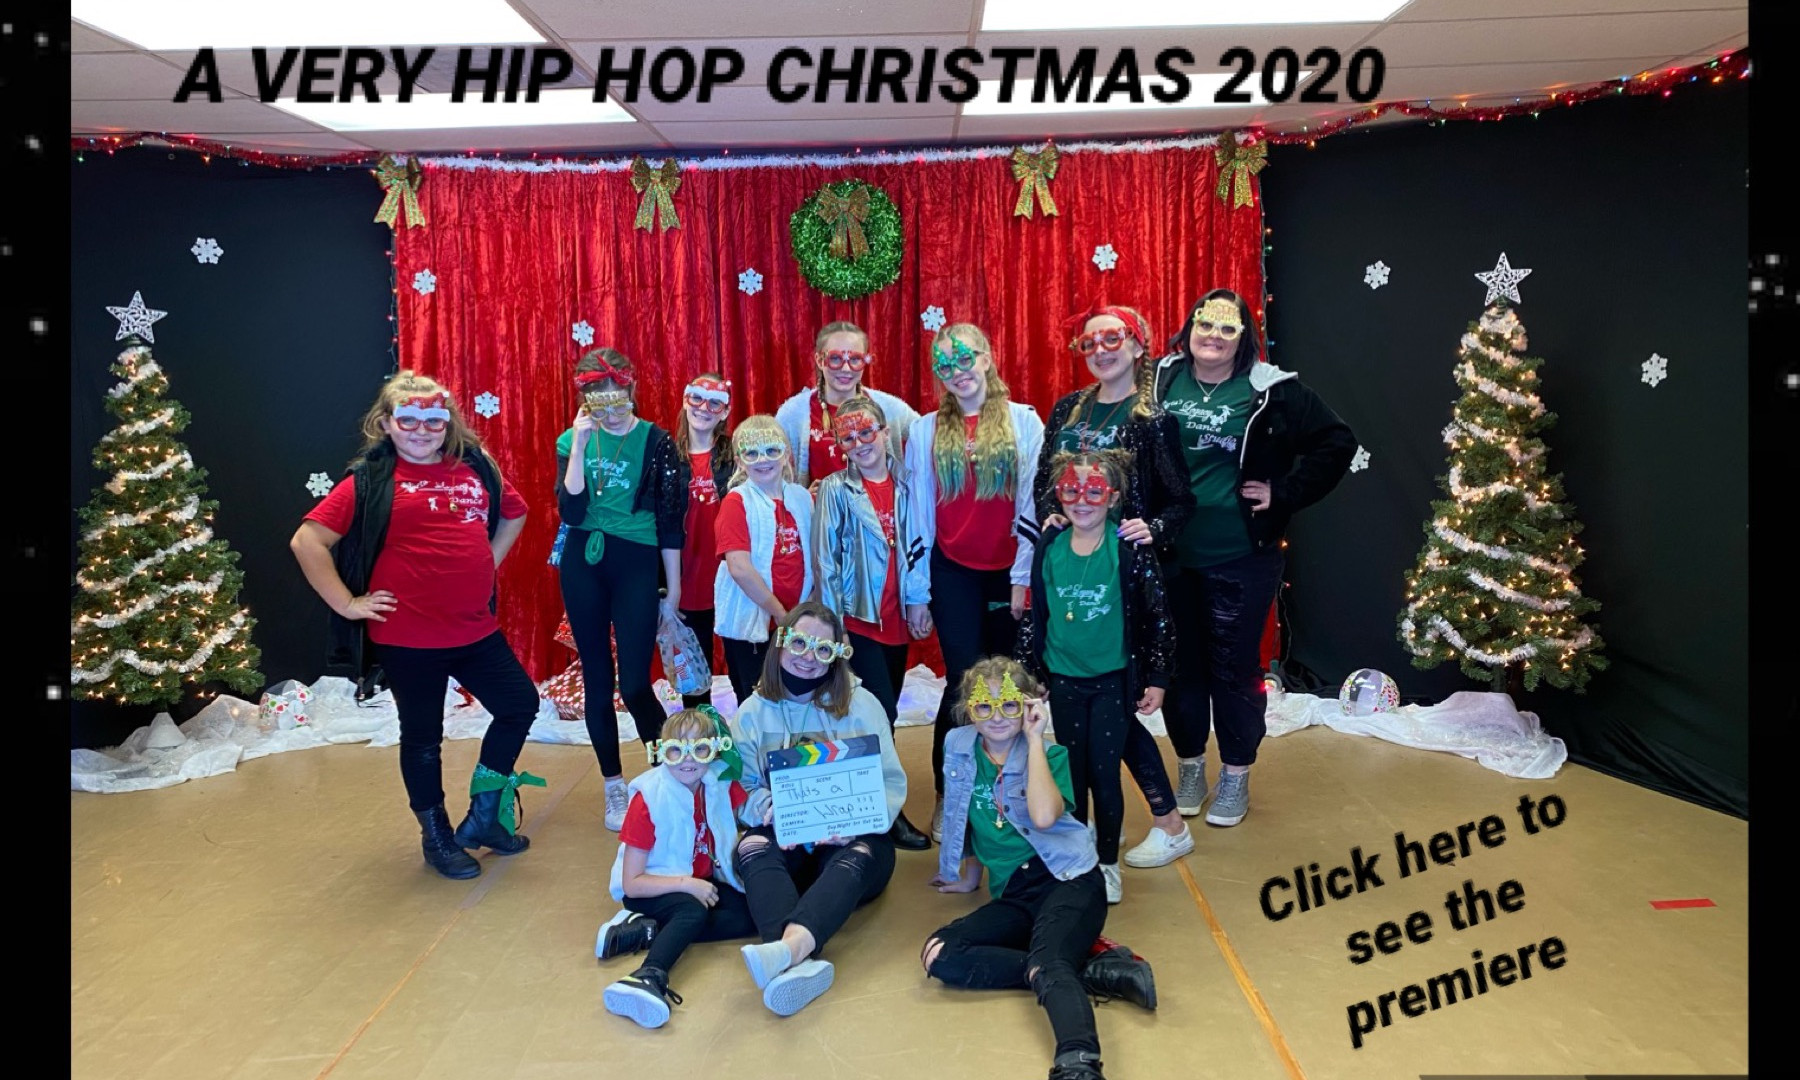 A Very Hip Hop Christmas 2020